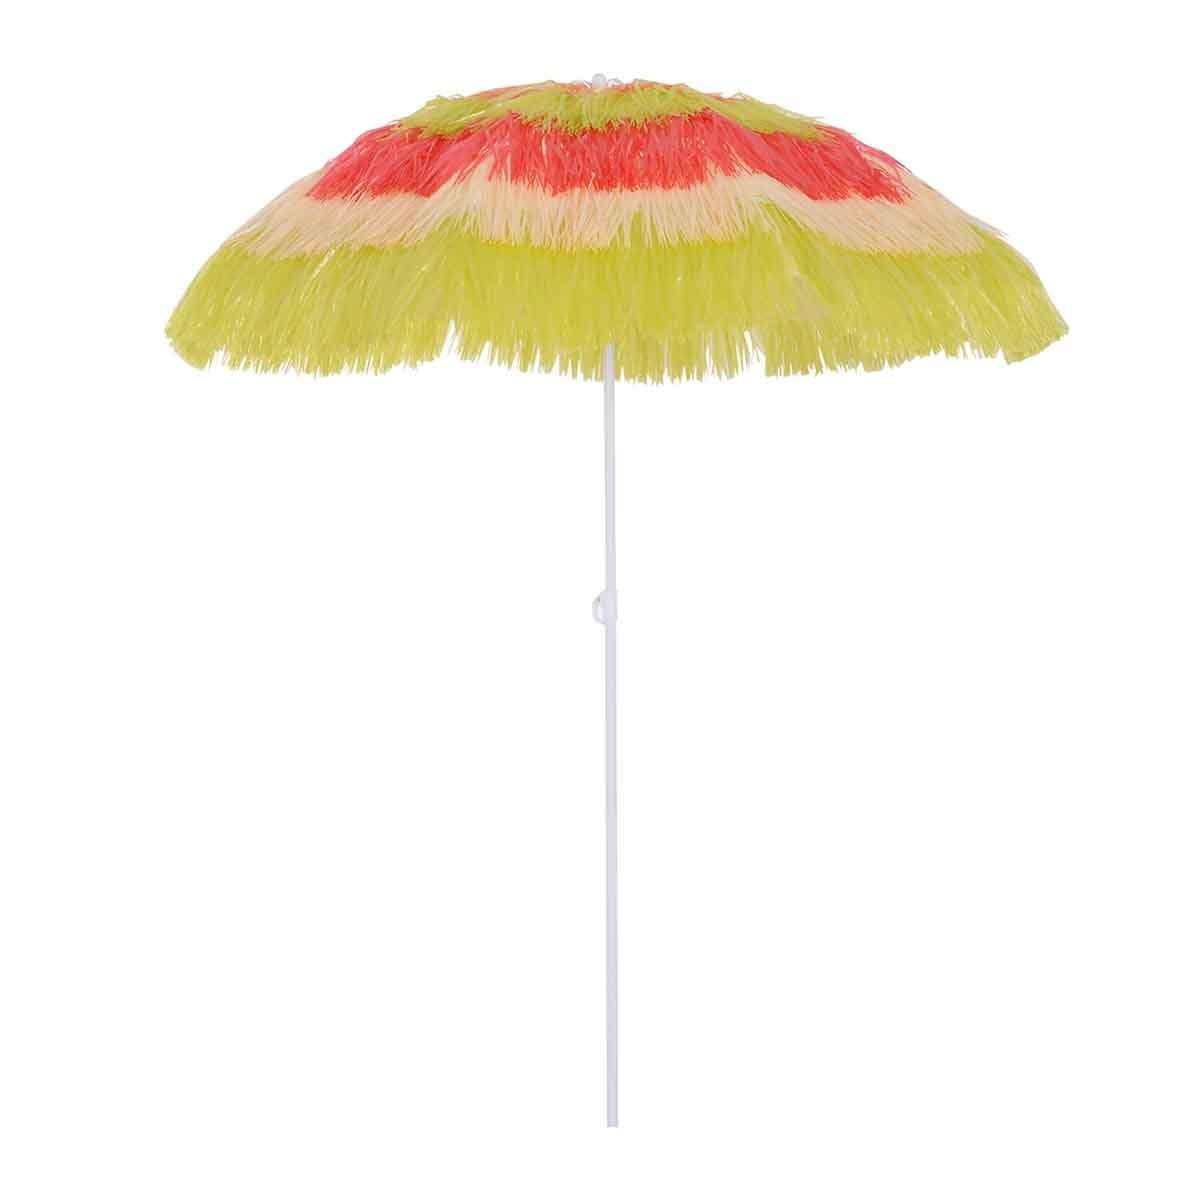 Outsunny Hawaii Garden Parasol (base not included) - Multicoloured